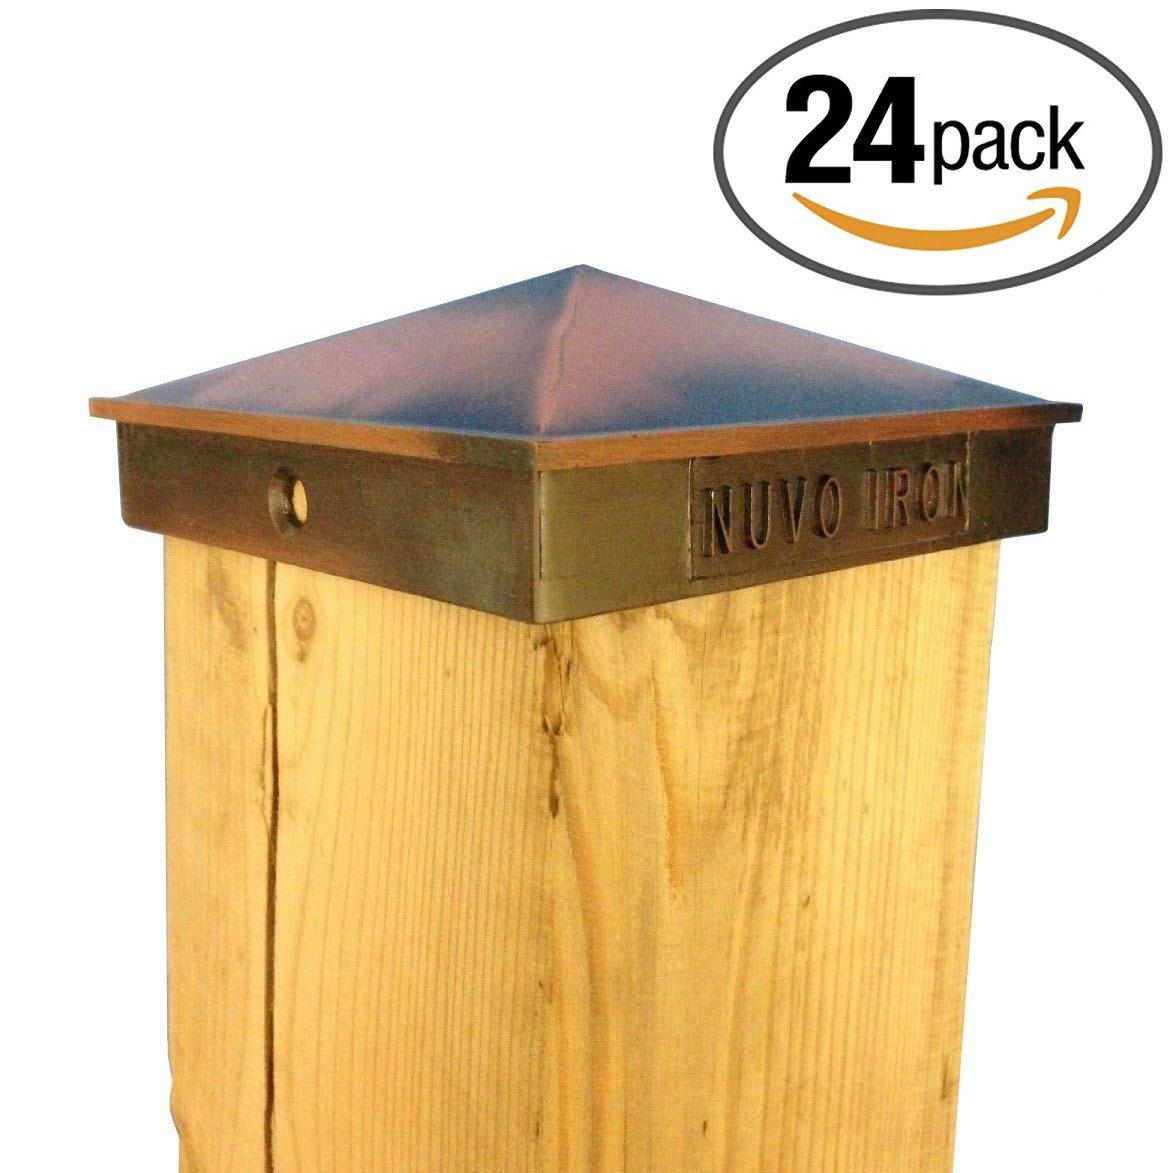 Nuvo Iron Decorative Pyramid Aluminium Post Cap for (True) 6'' x 6'' Posts - Copper Plated [24 PACK]